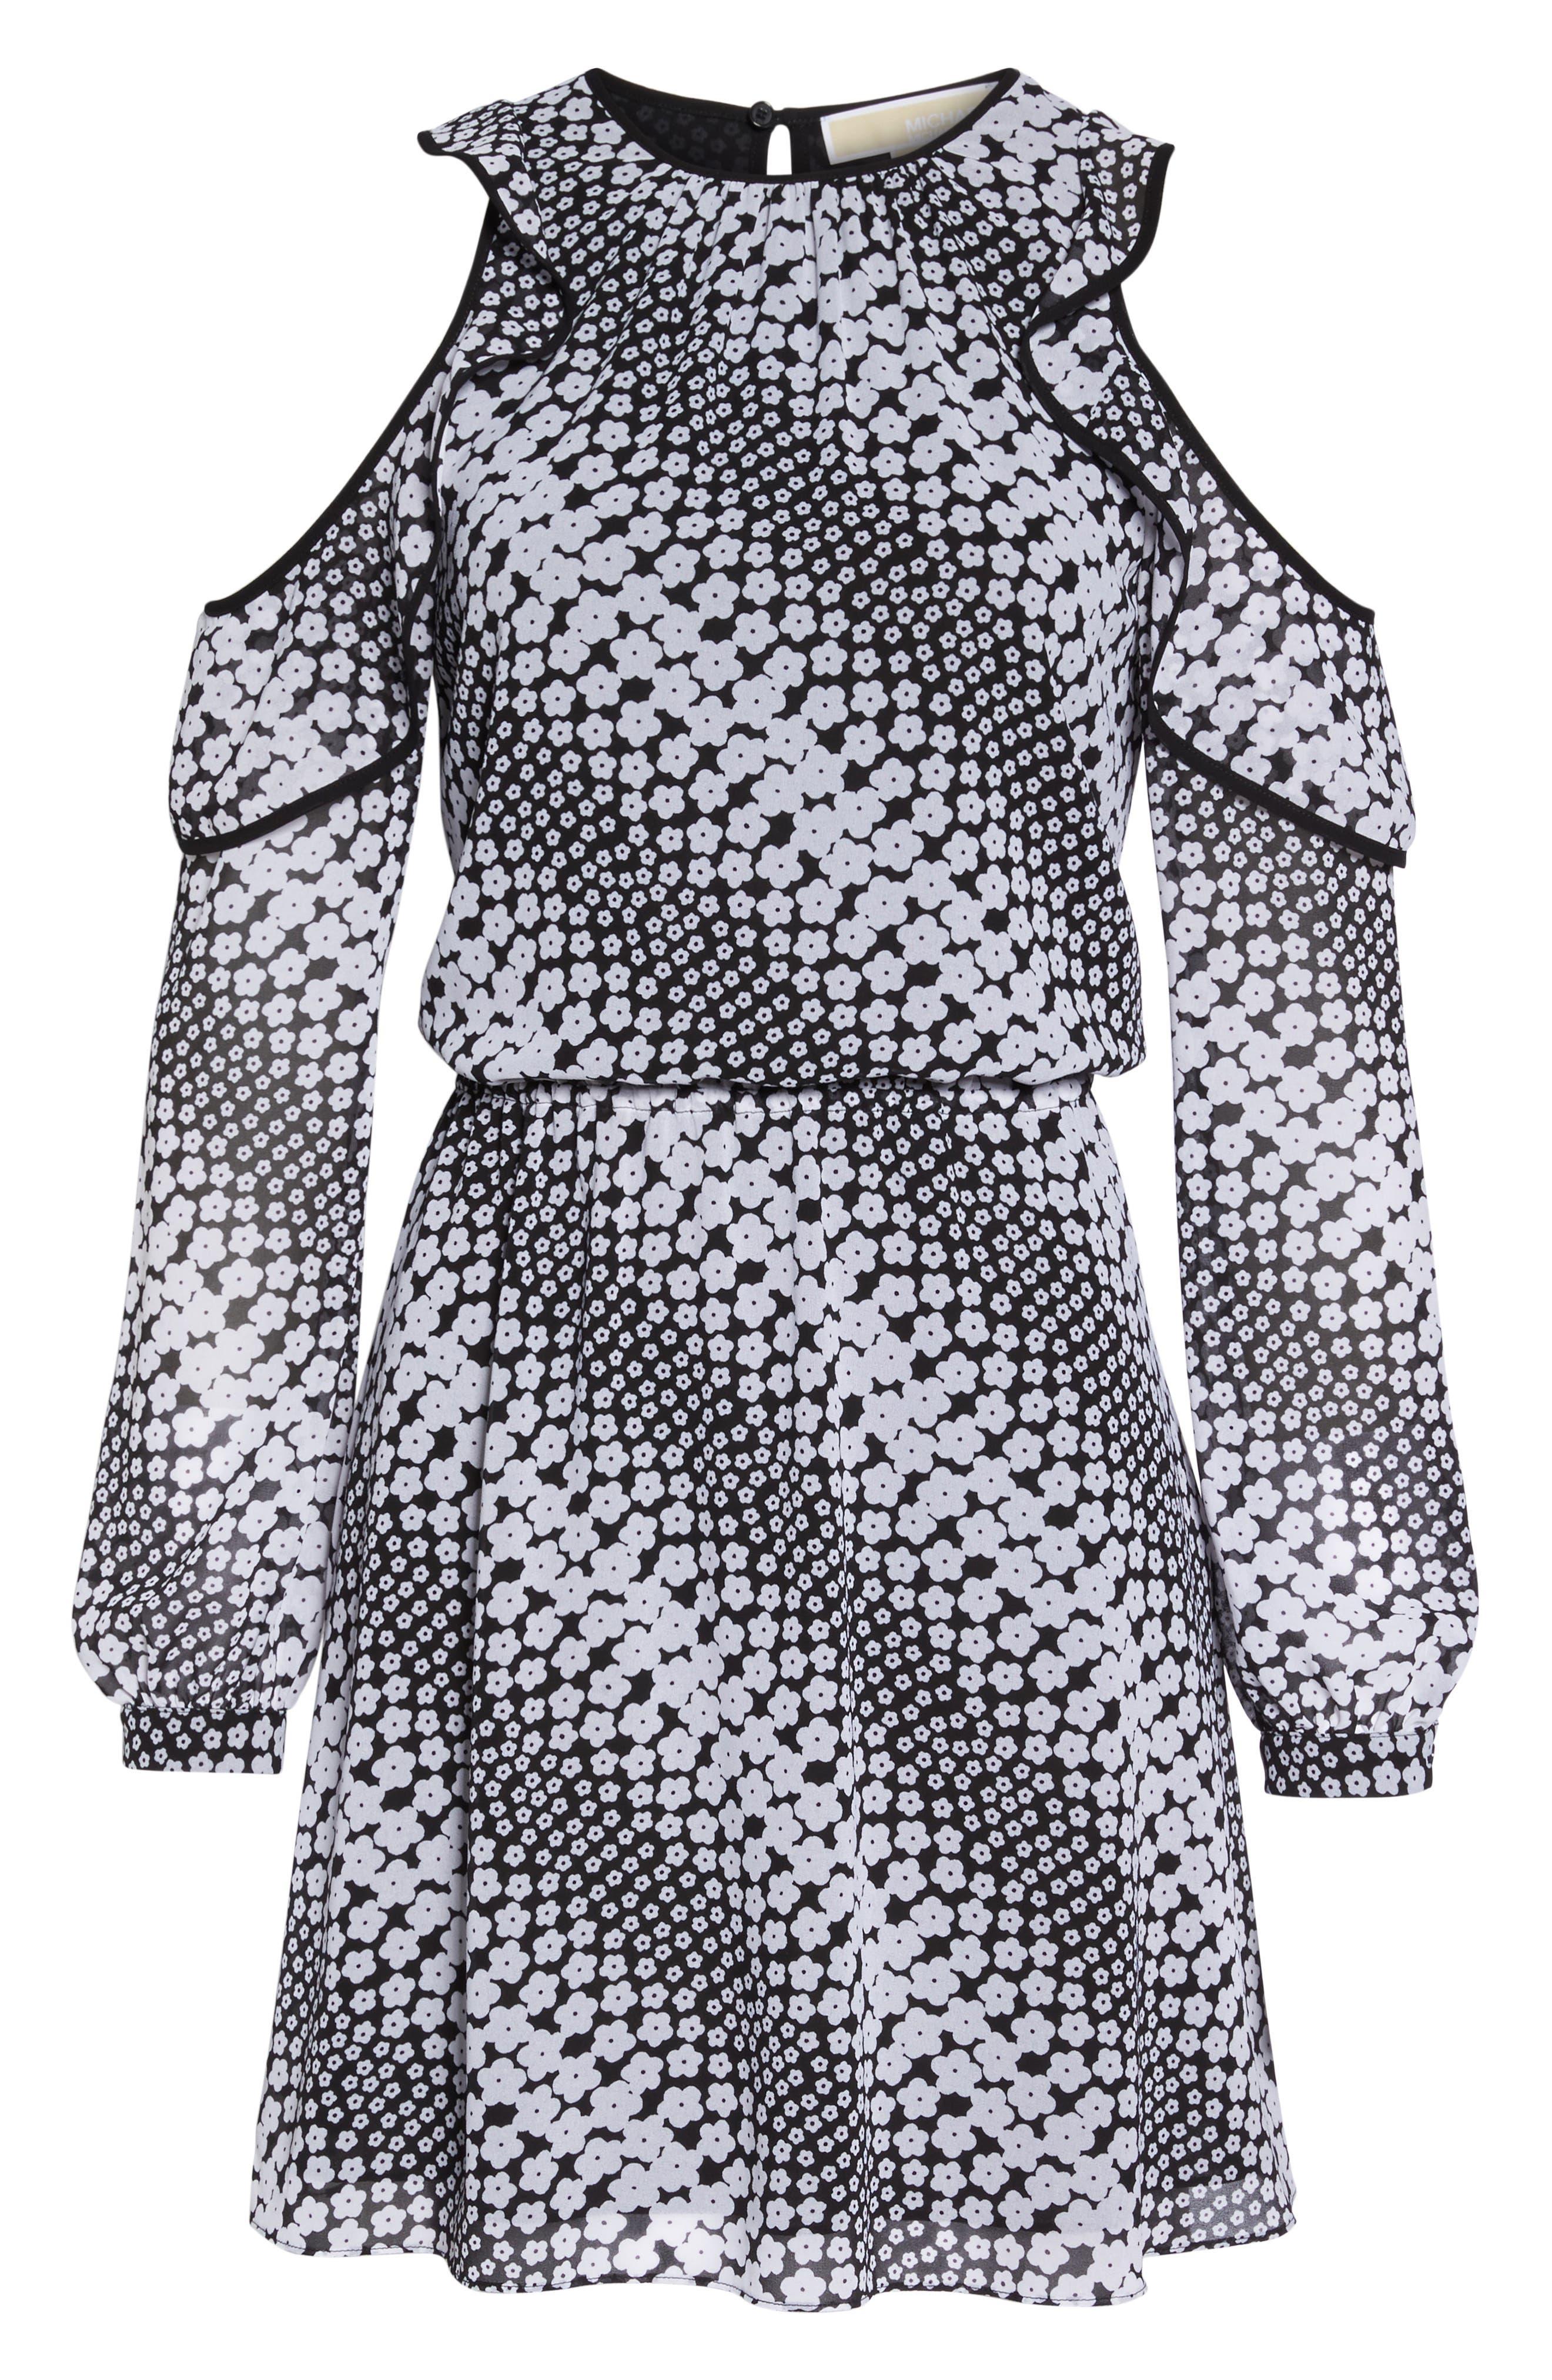 Cold Shoulder Blouson Dress,                             Alternate thumbnail 6, color,                             Black/ White